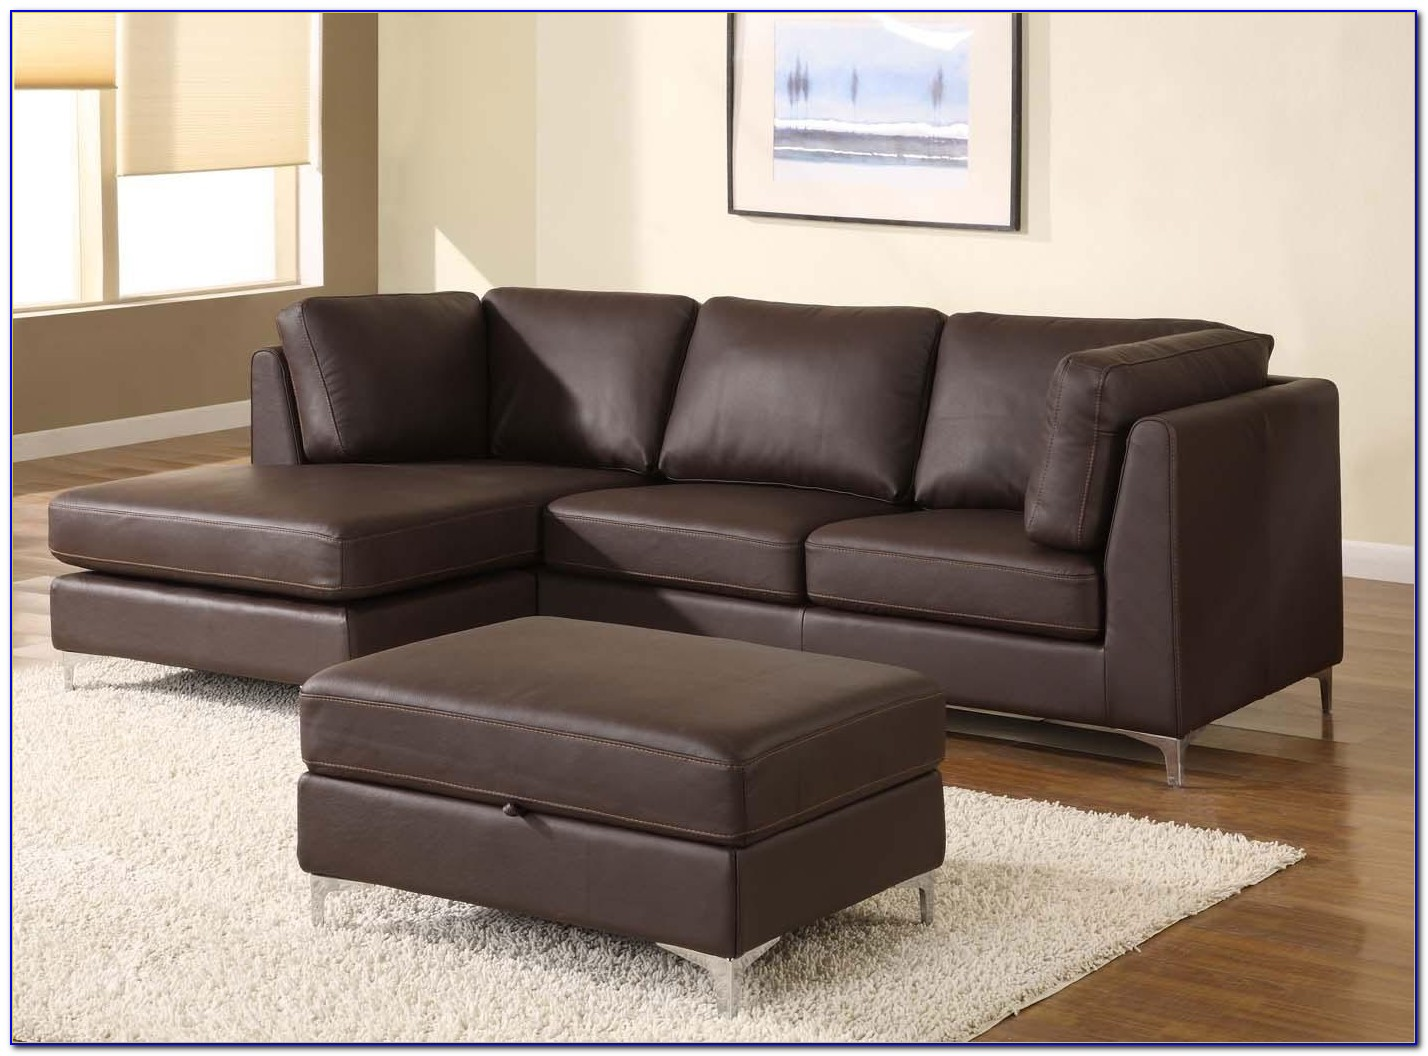 Living Room Furniture Sectional Sets